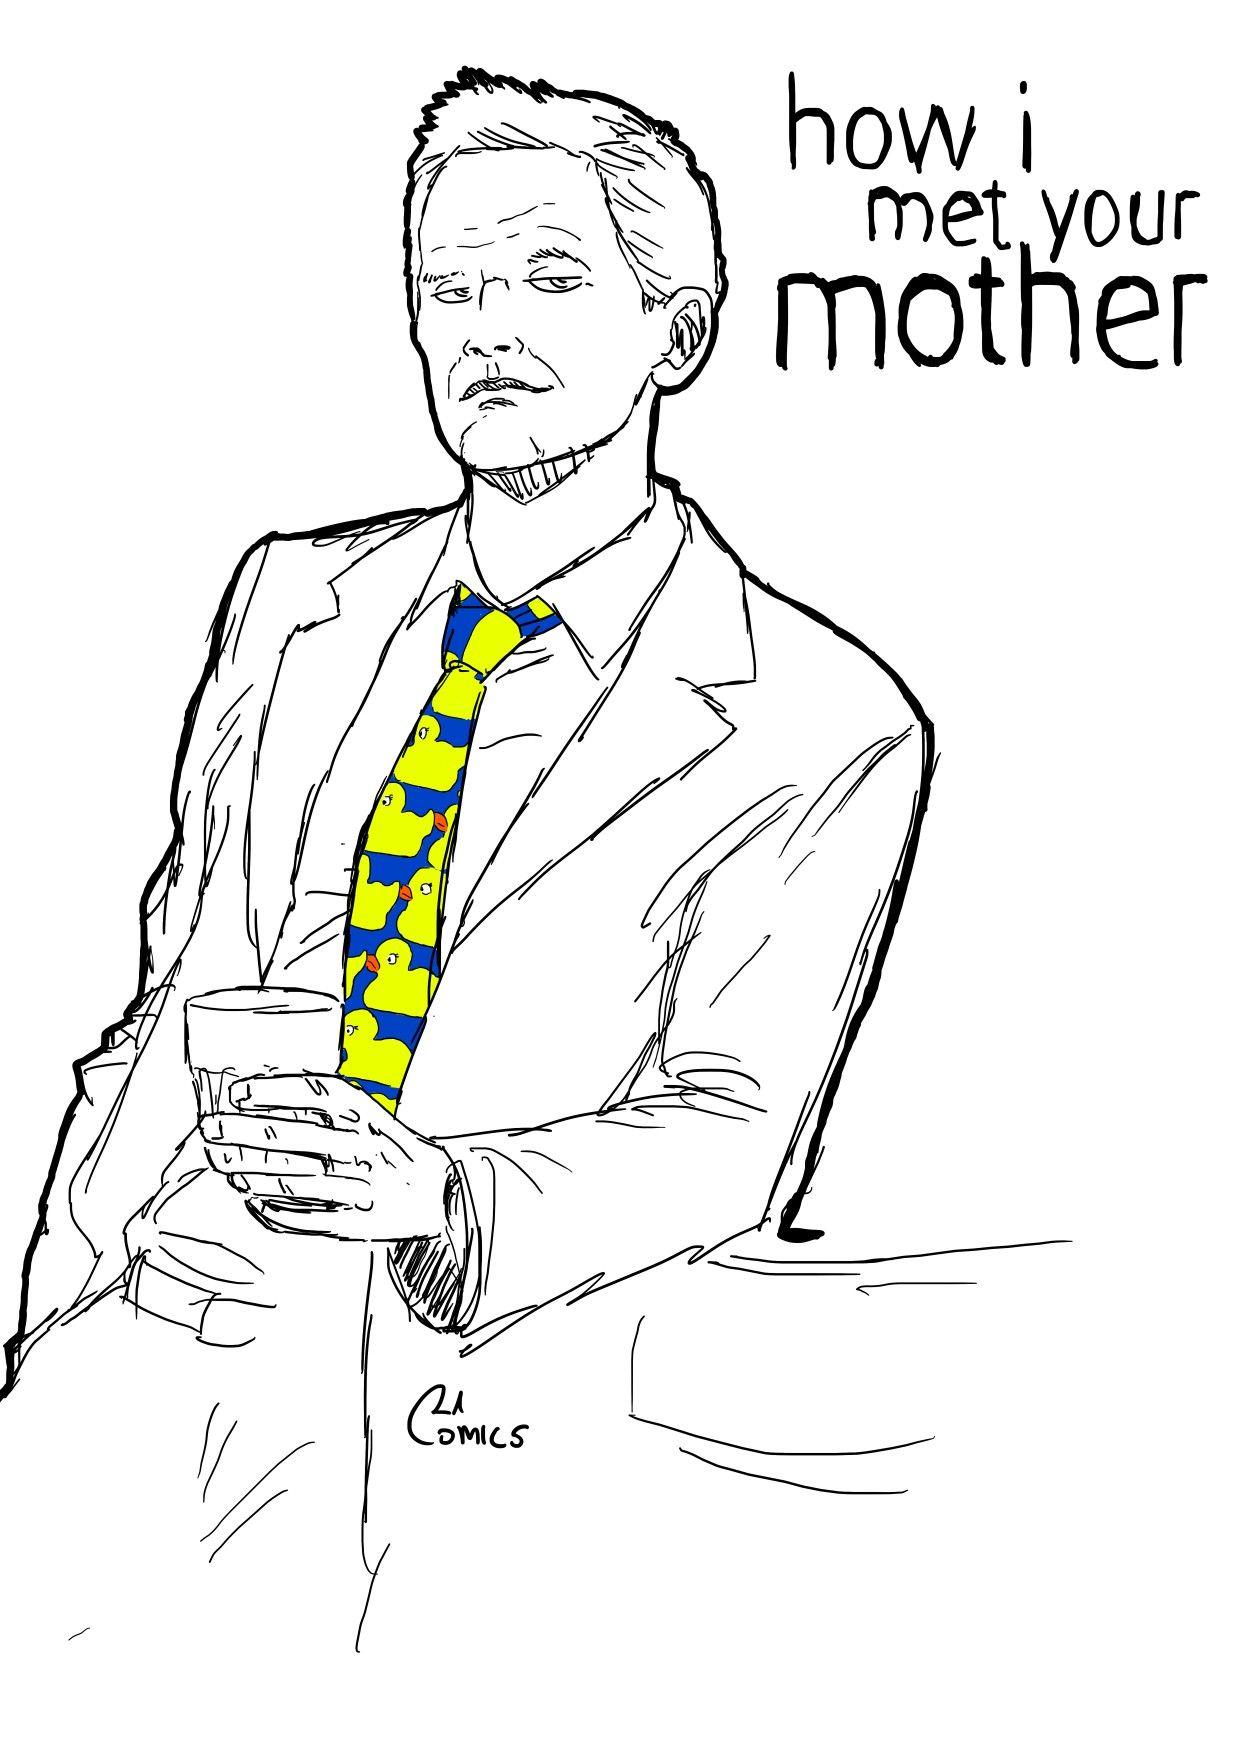 Barney Stinson How i met your mother artdrawcomicsgvcomics ...